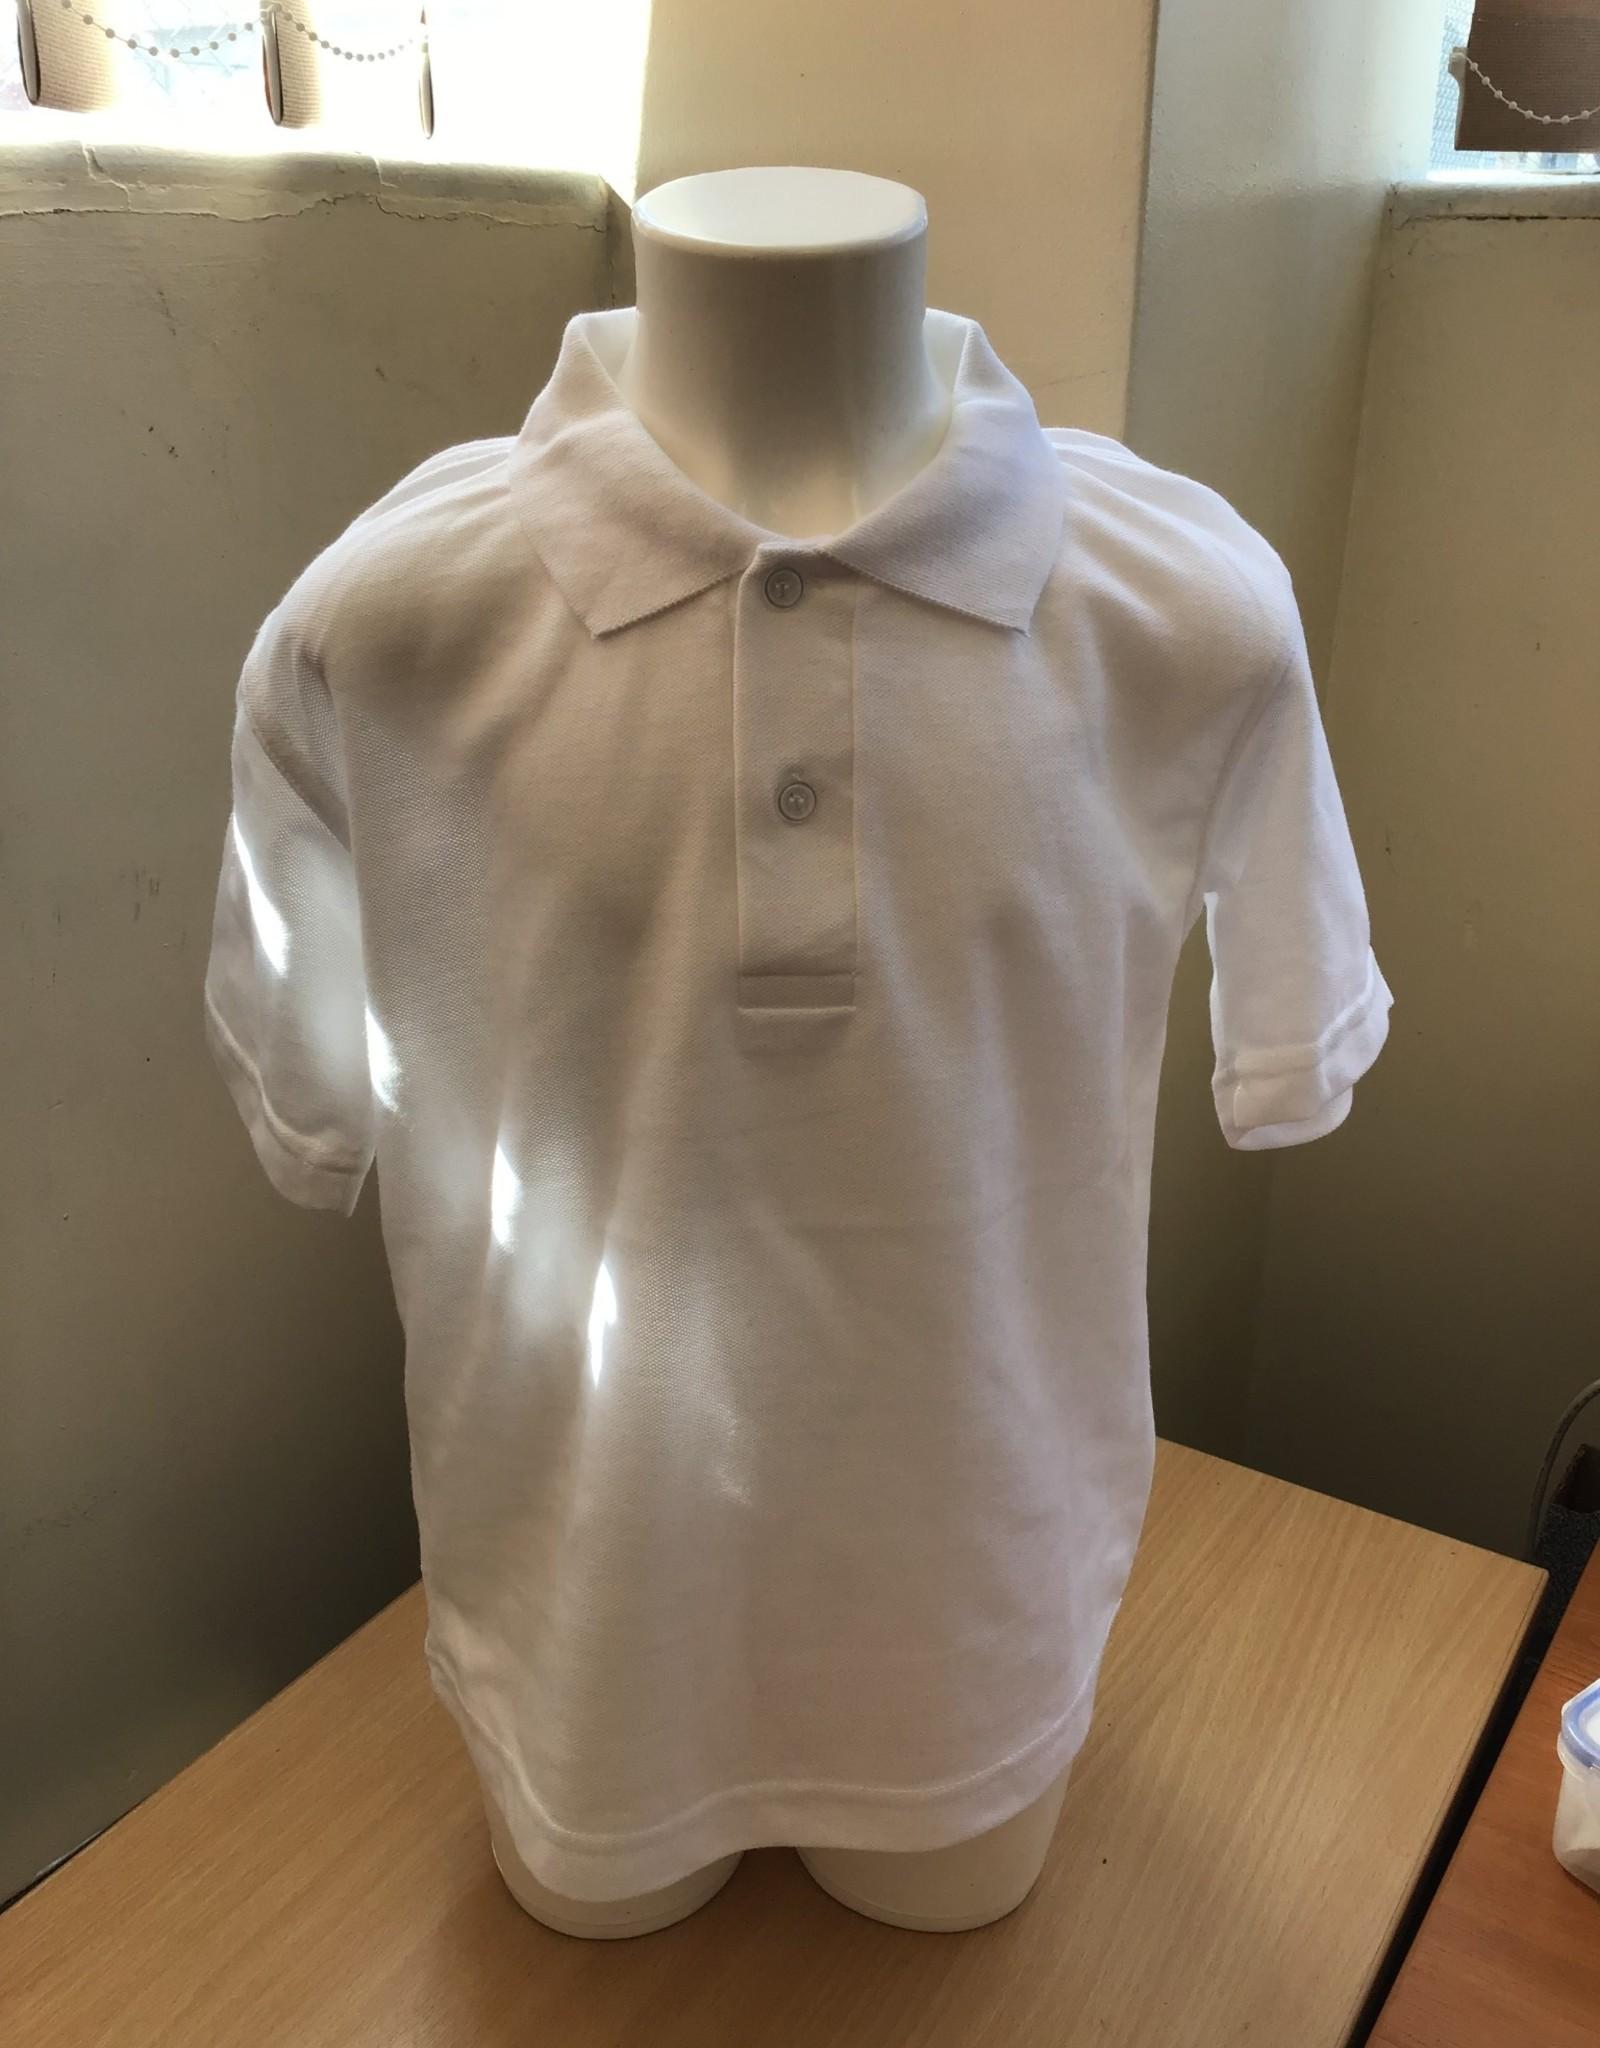 Polo-Shirt Child Size - All Saints